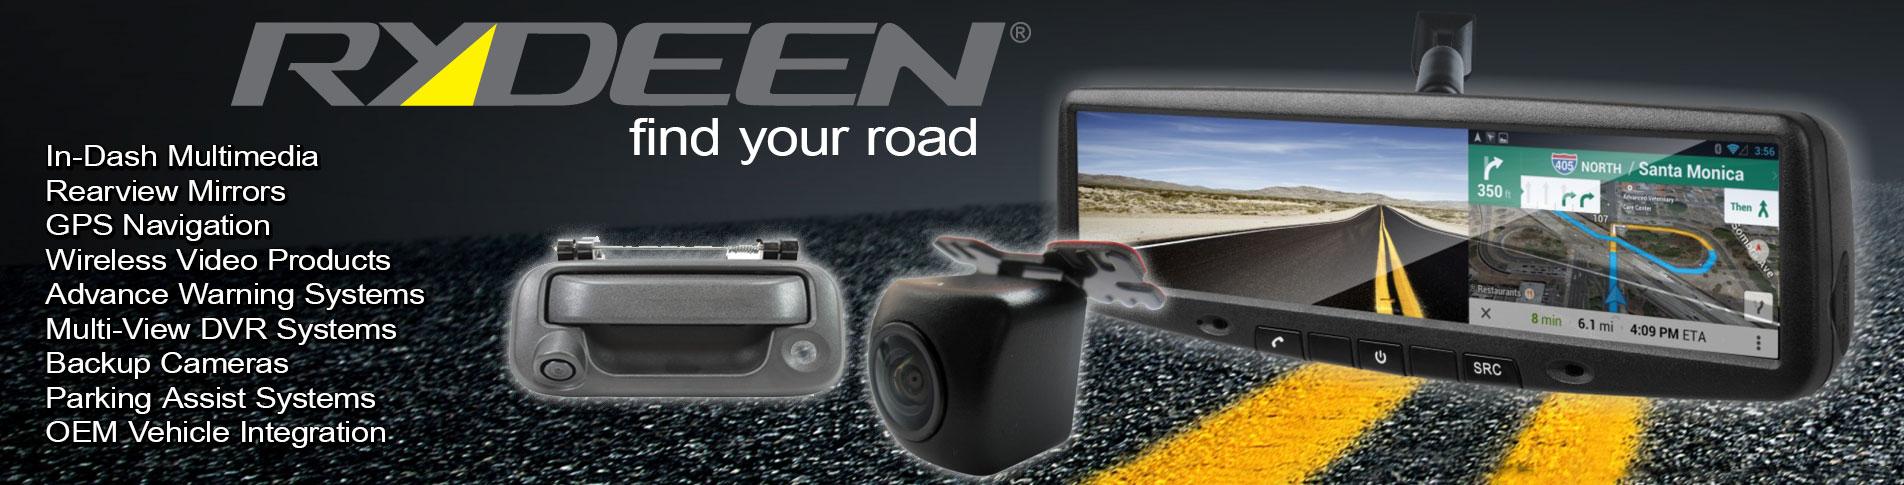 Rydeen - Backup Cameras & Sensors